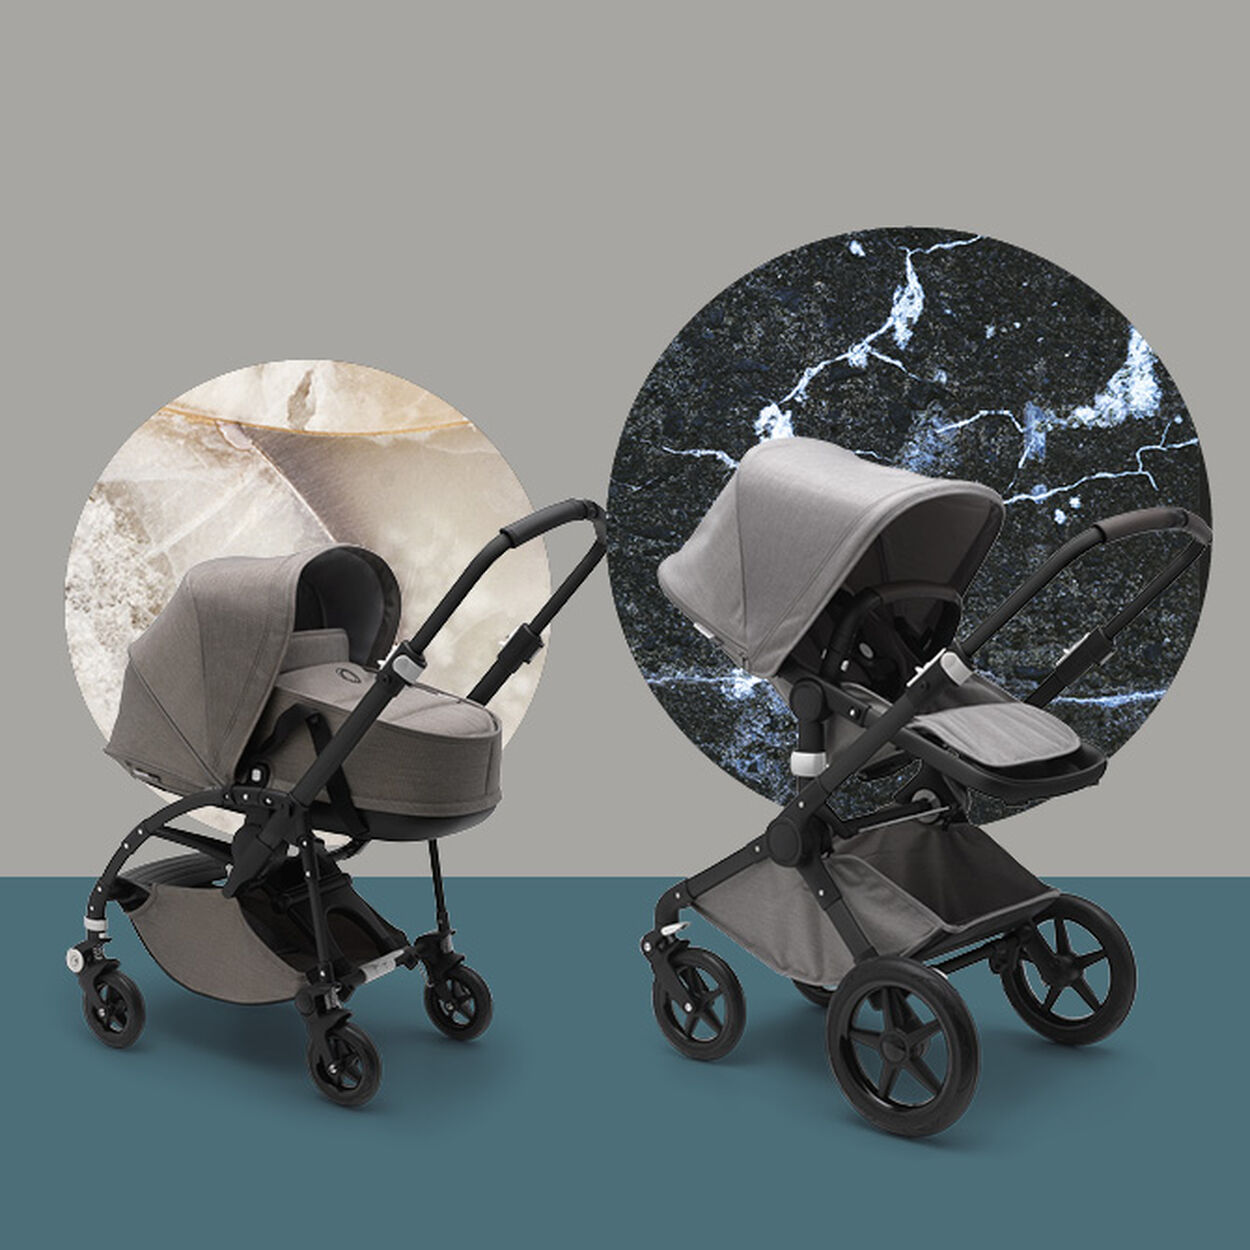 Bugaboo Kinderwagen | Luxus Kinderwagen | Bugaboo AT